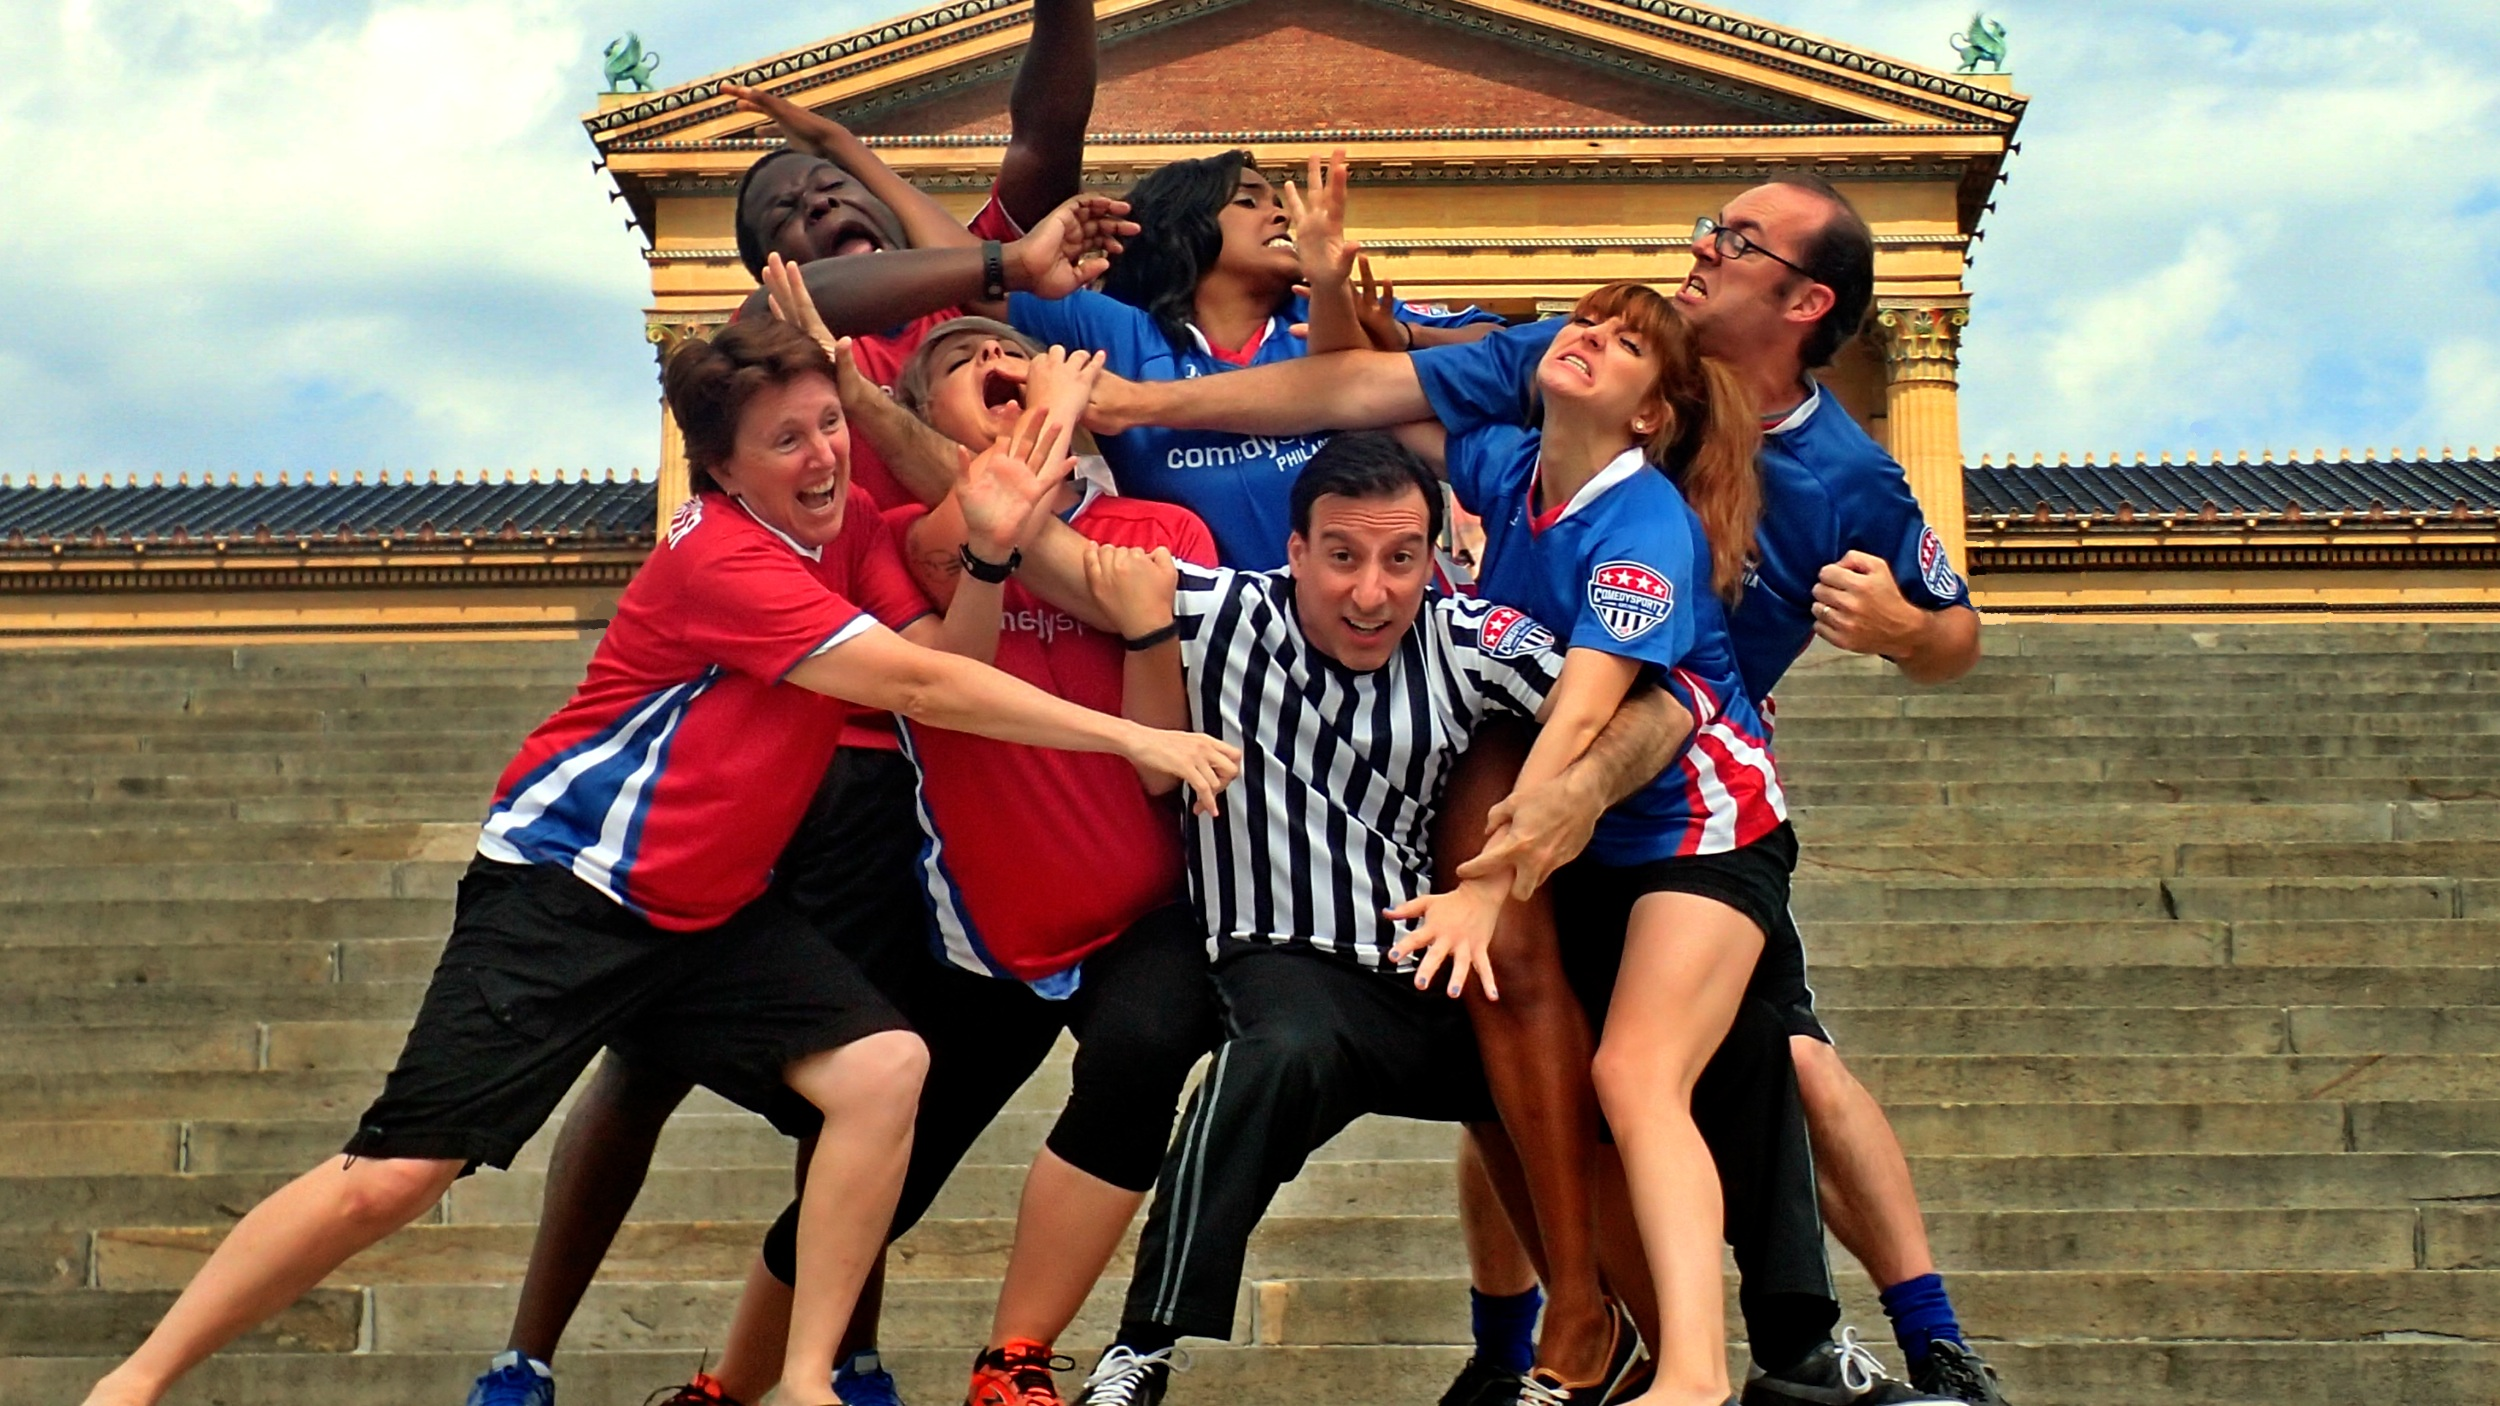 ComedySportz Philadelphia